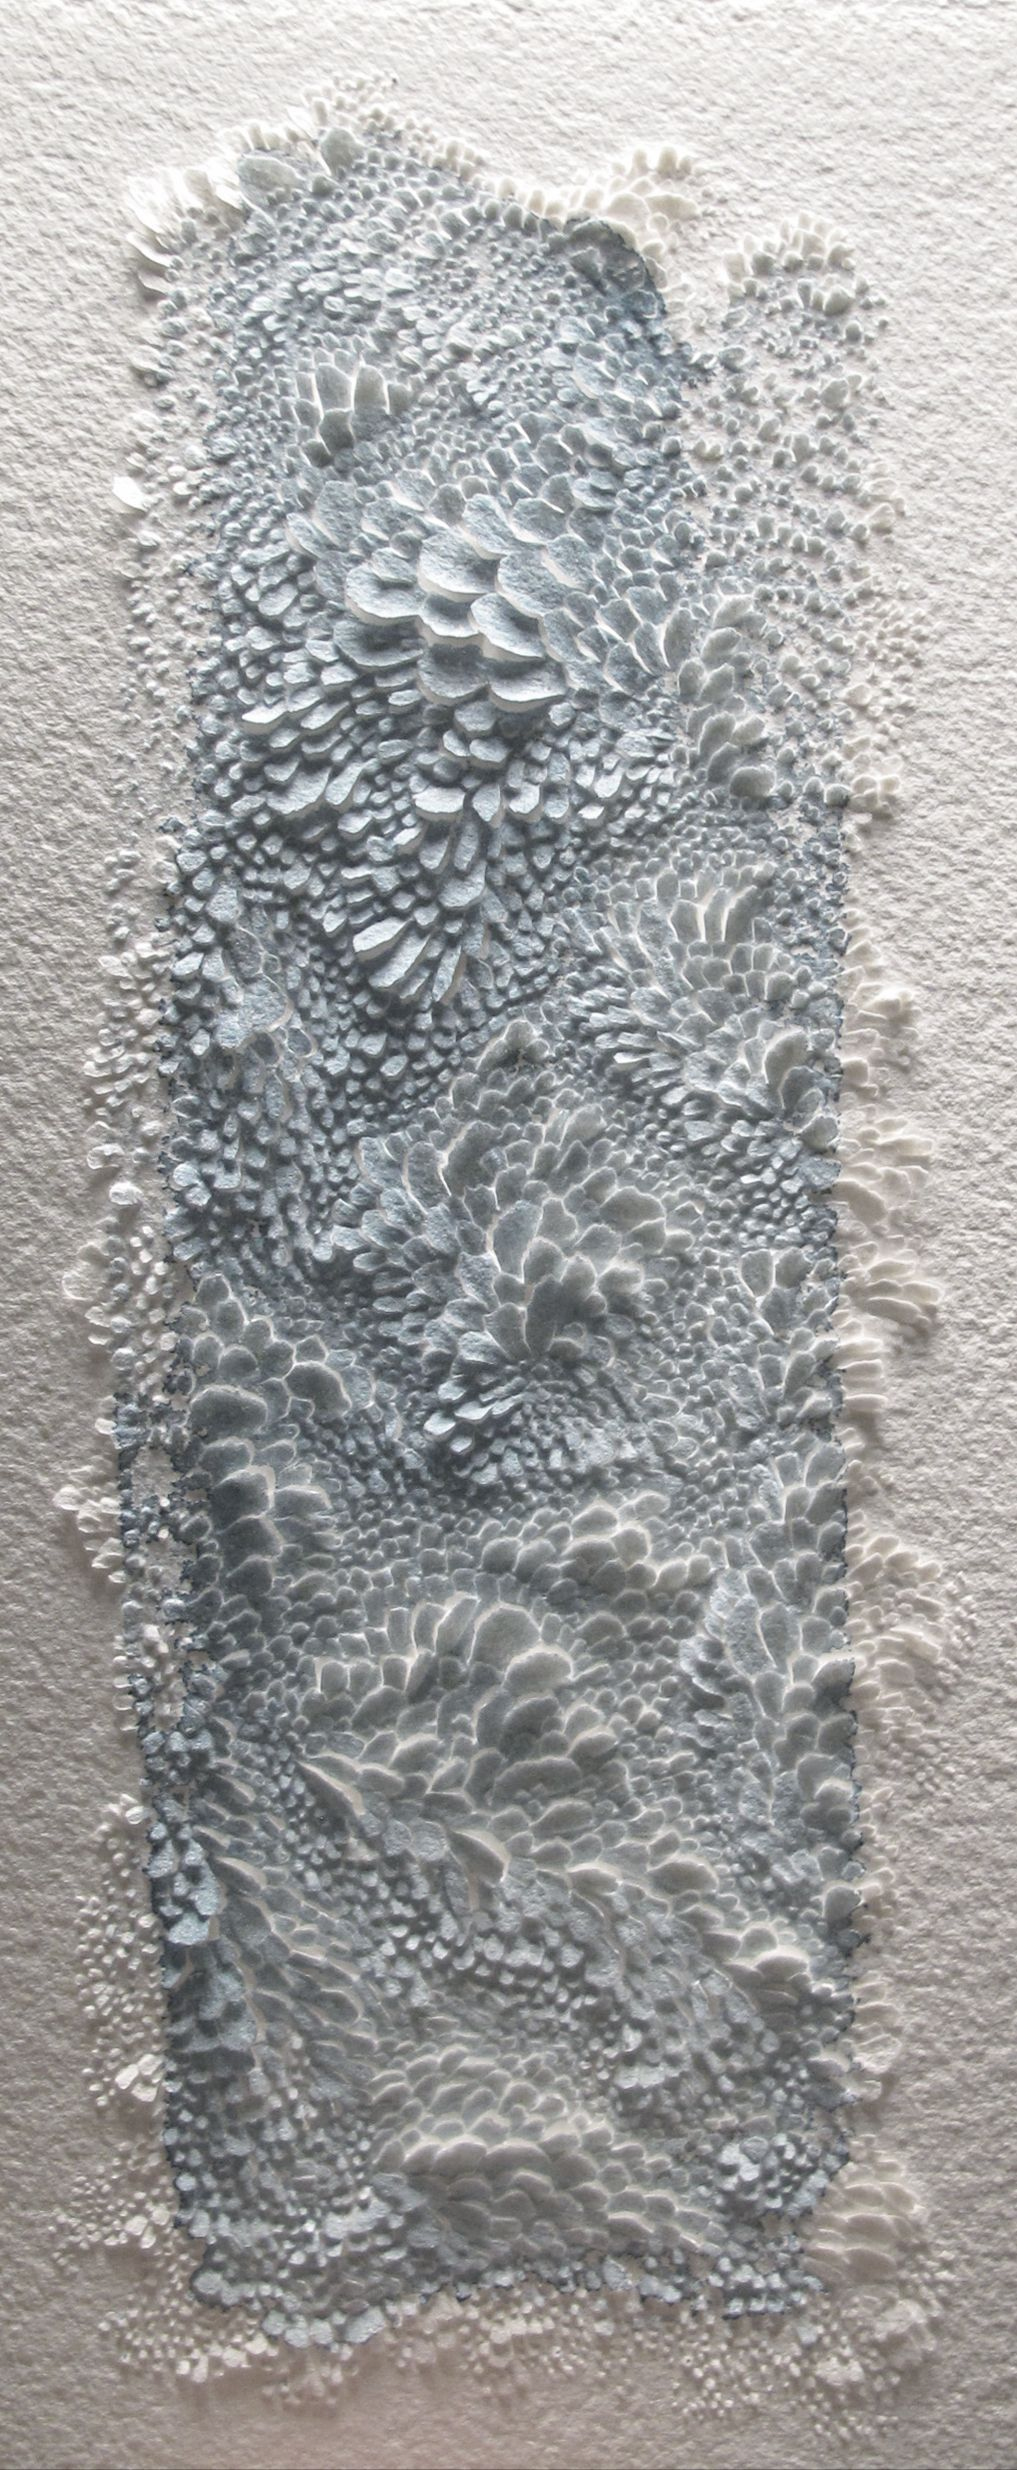 Basrelief Aquarelle Torchon Clauren Papier Collin Grain